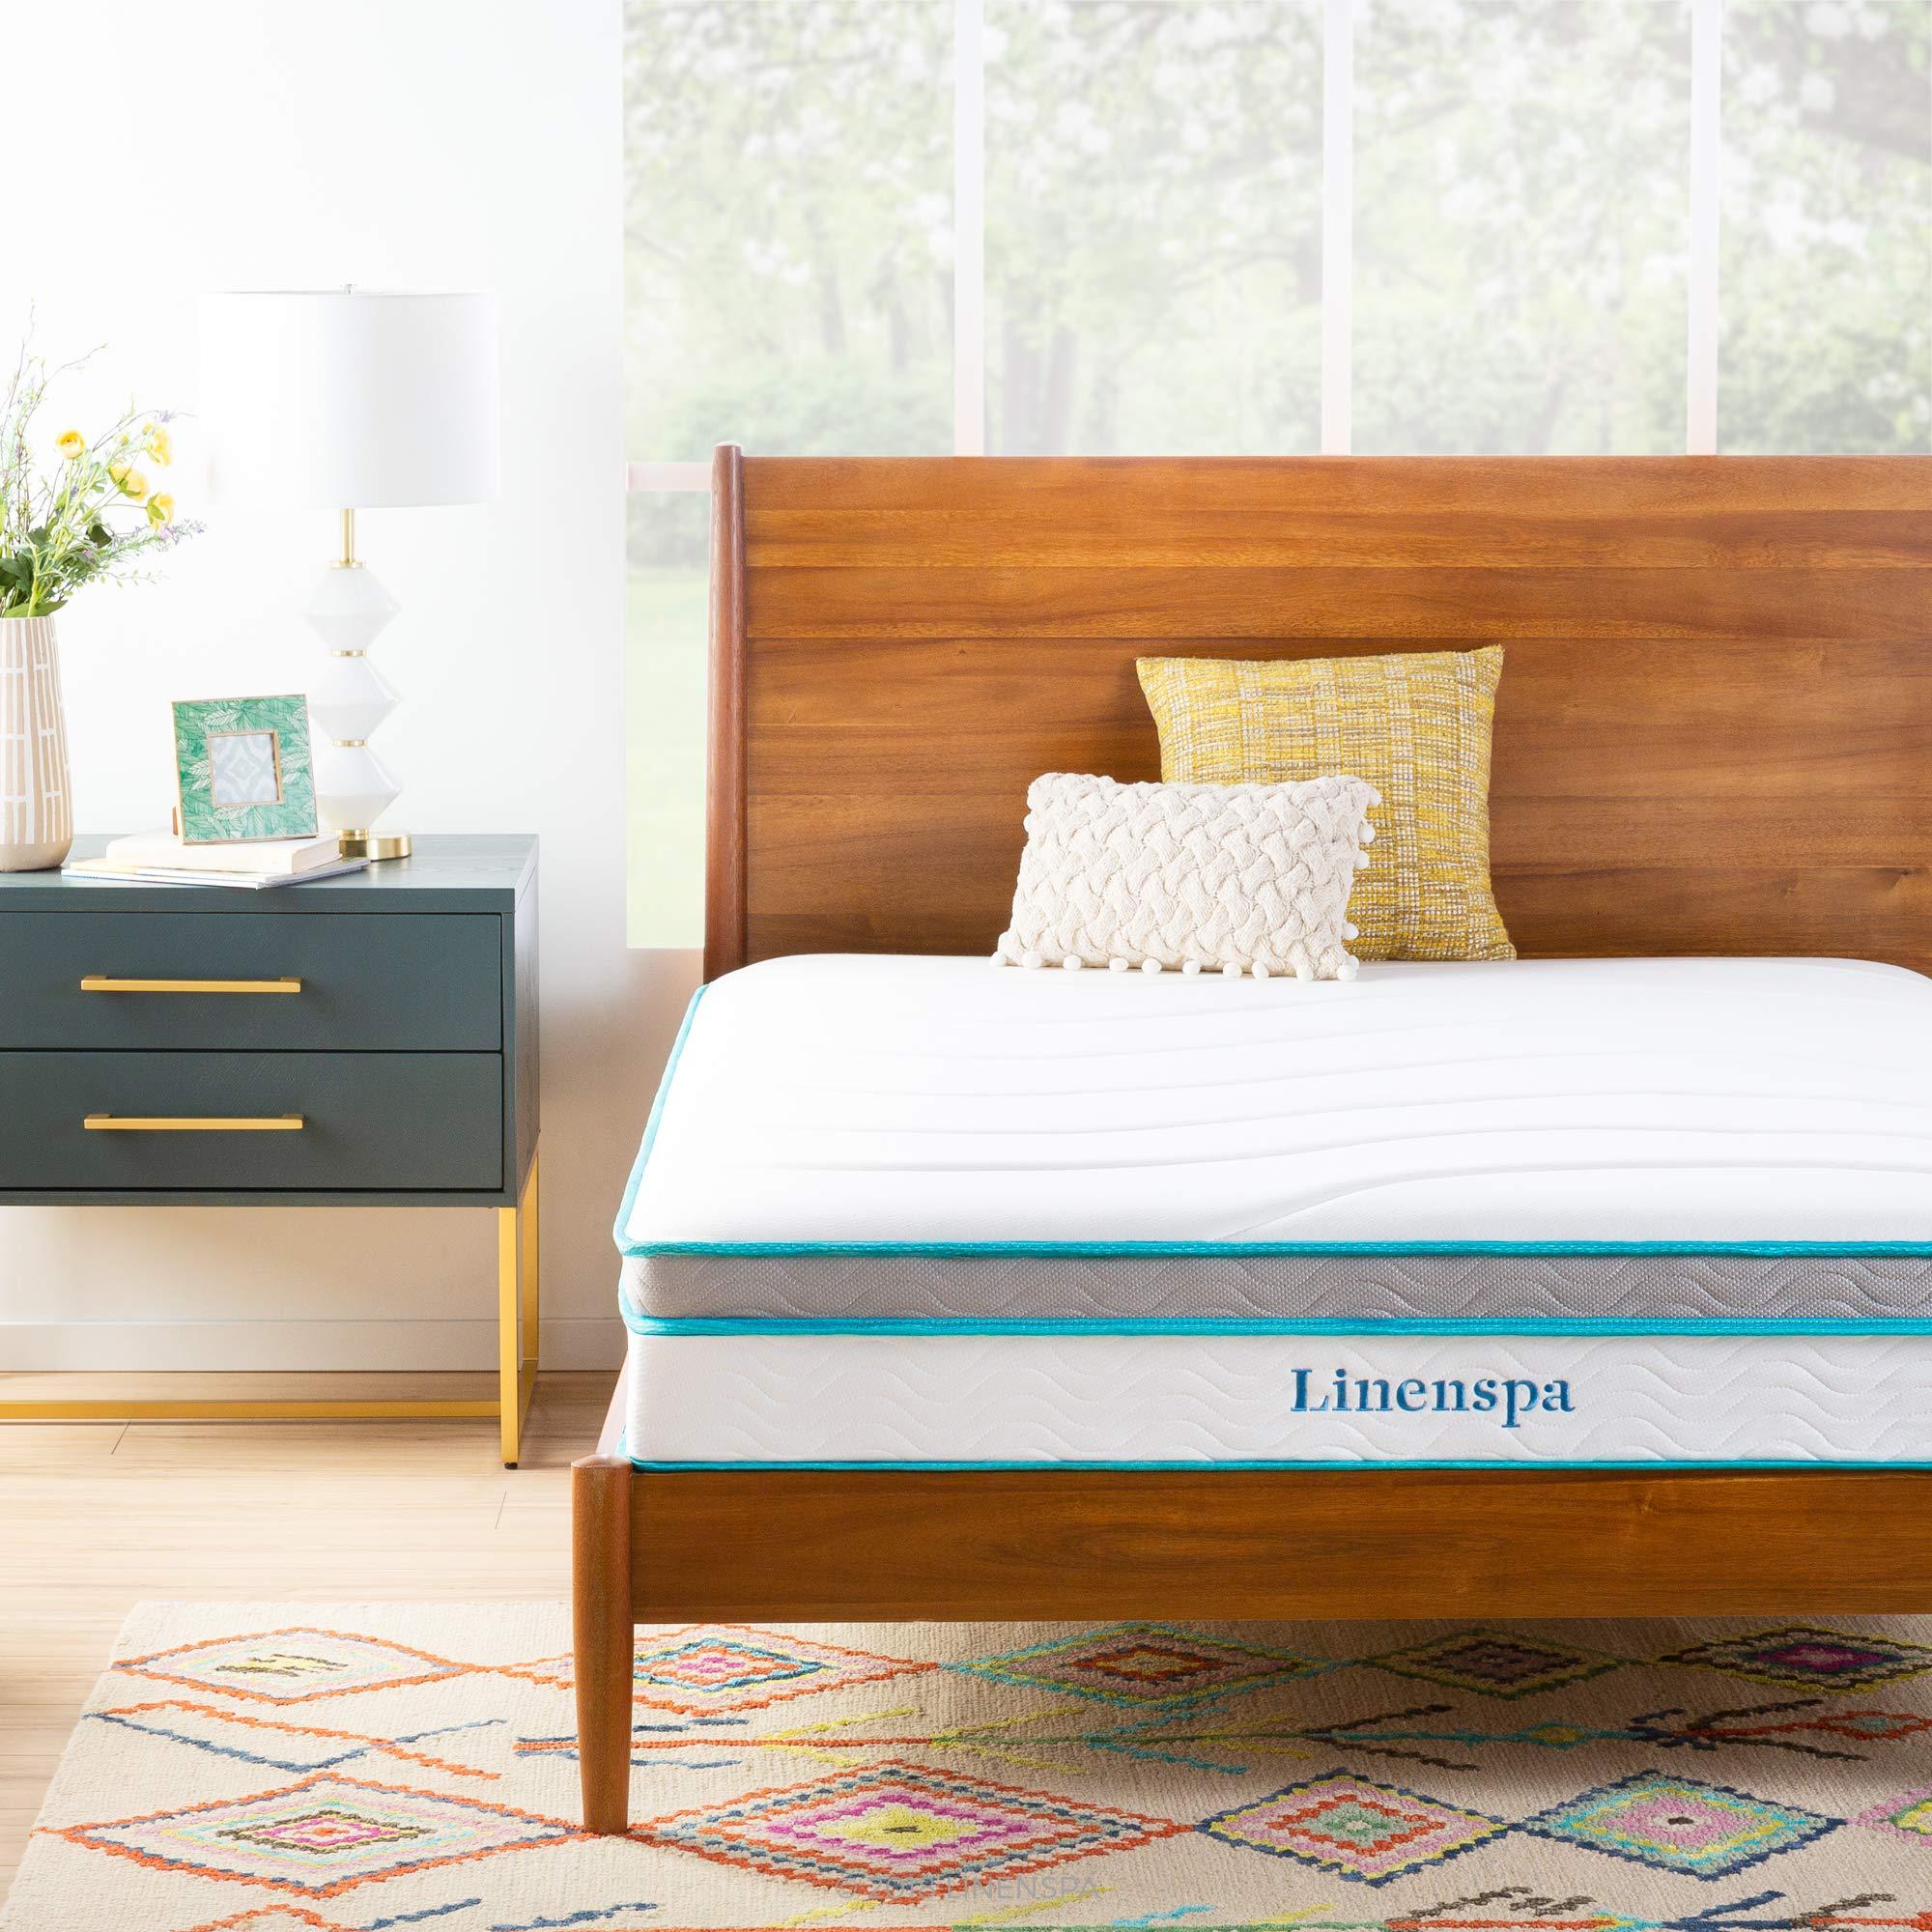 Linenspa 10 Inch Memory Foam and Innerspring Hybrid Mattress - Medium Feel - Queen by Linenspa